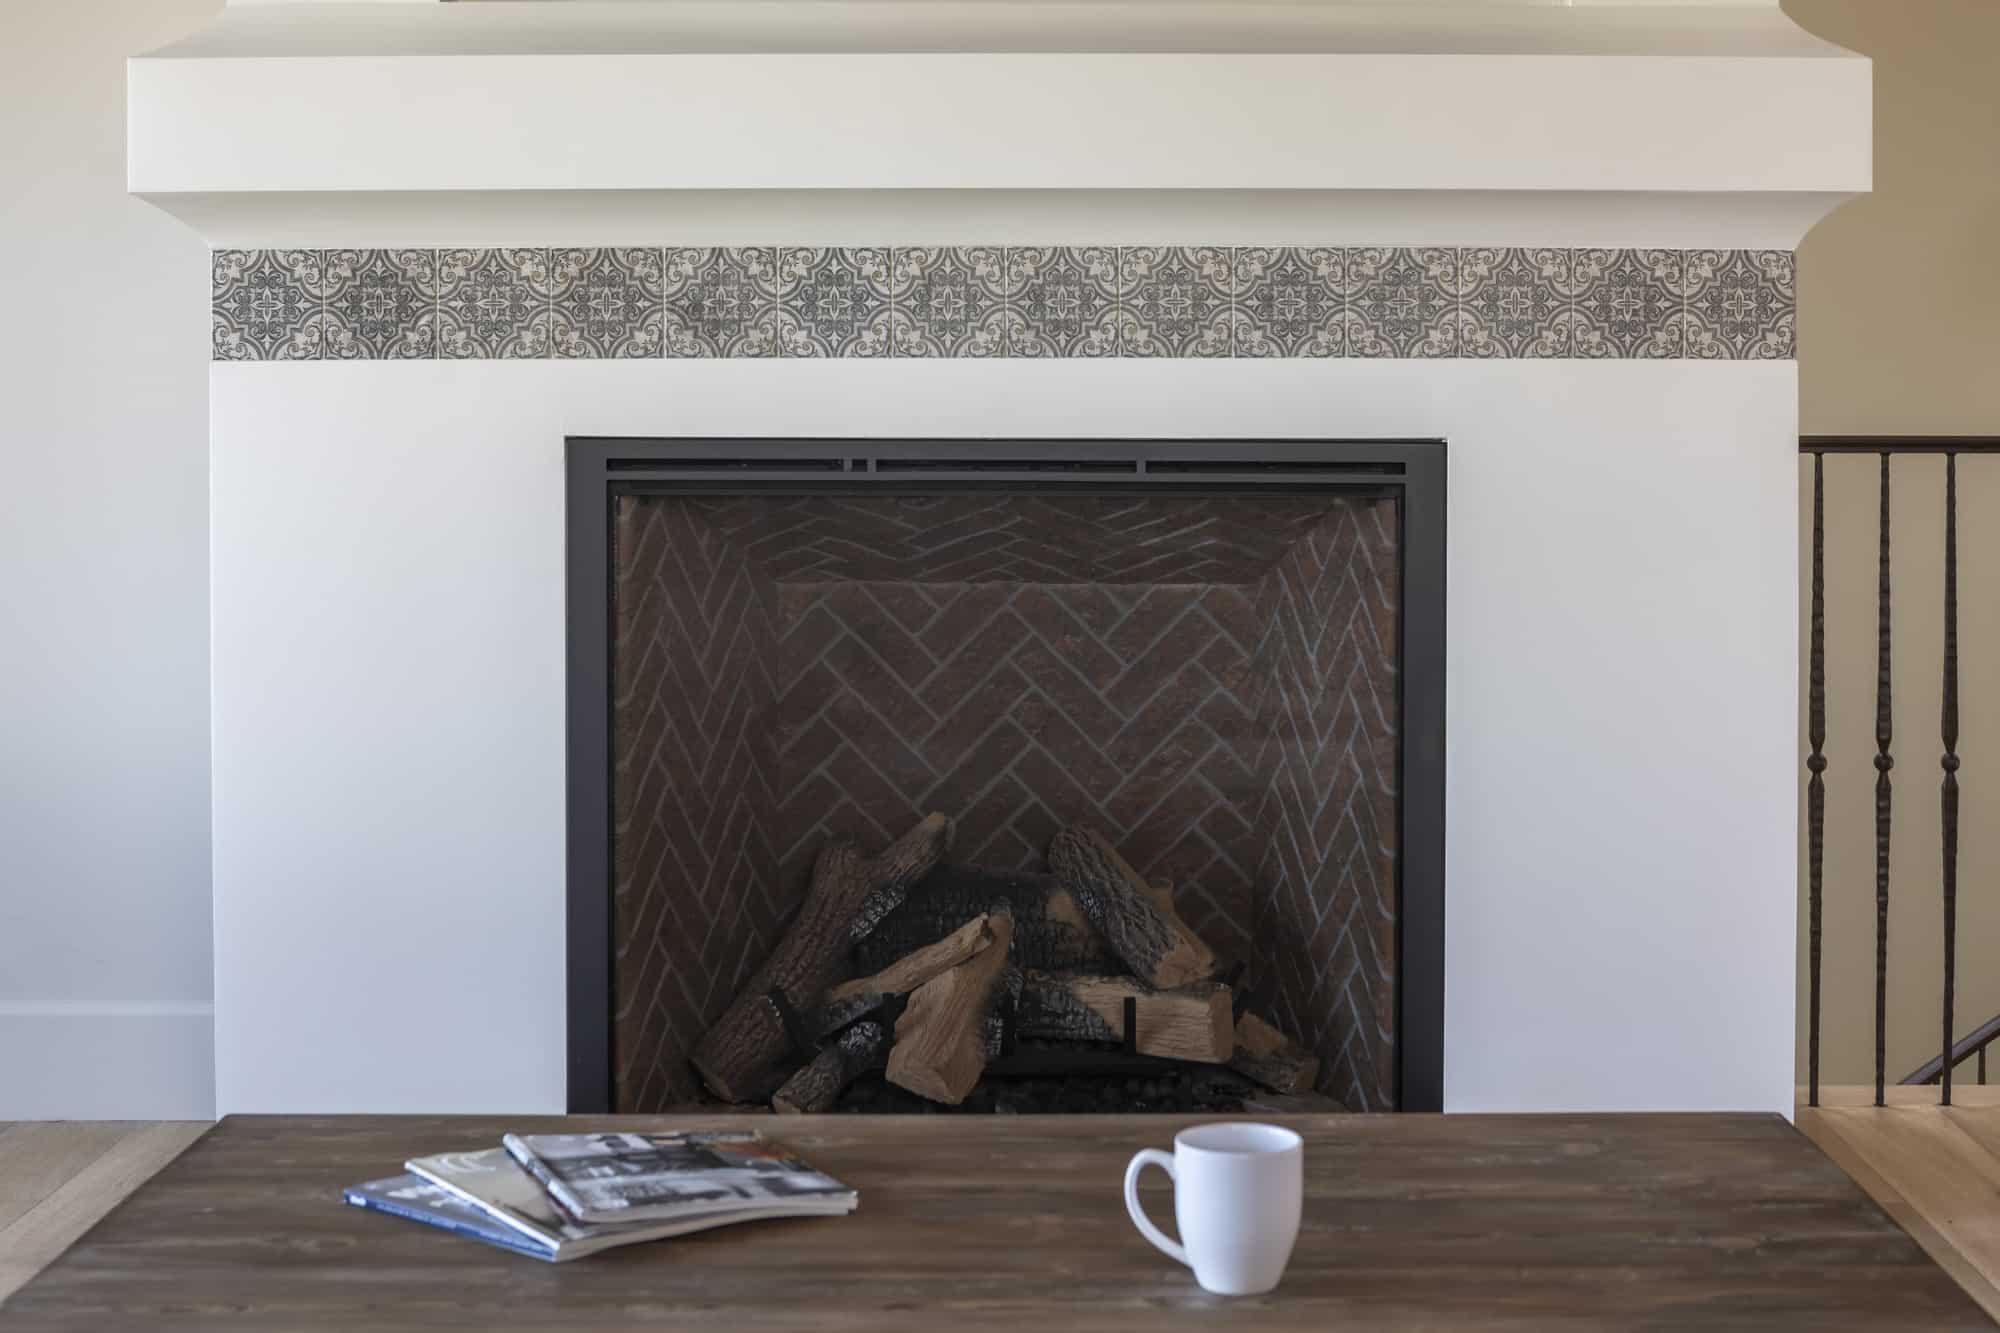 Ella (Jute) on Perle Blanc Fireplace Install